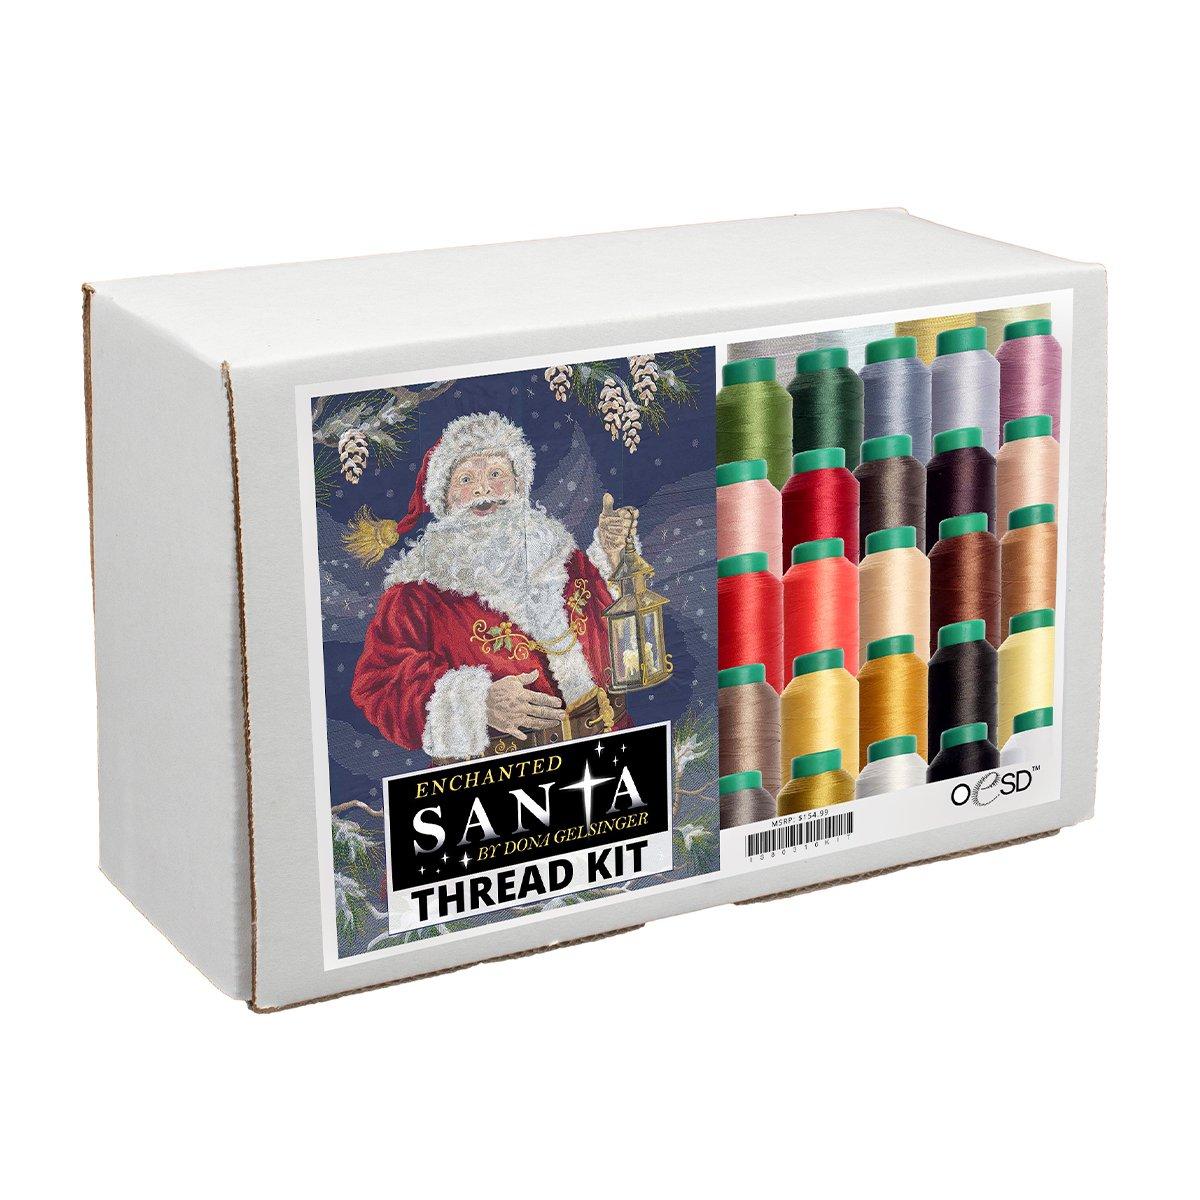 Enchanted Santa Thread Kit